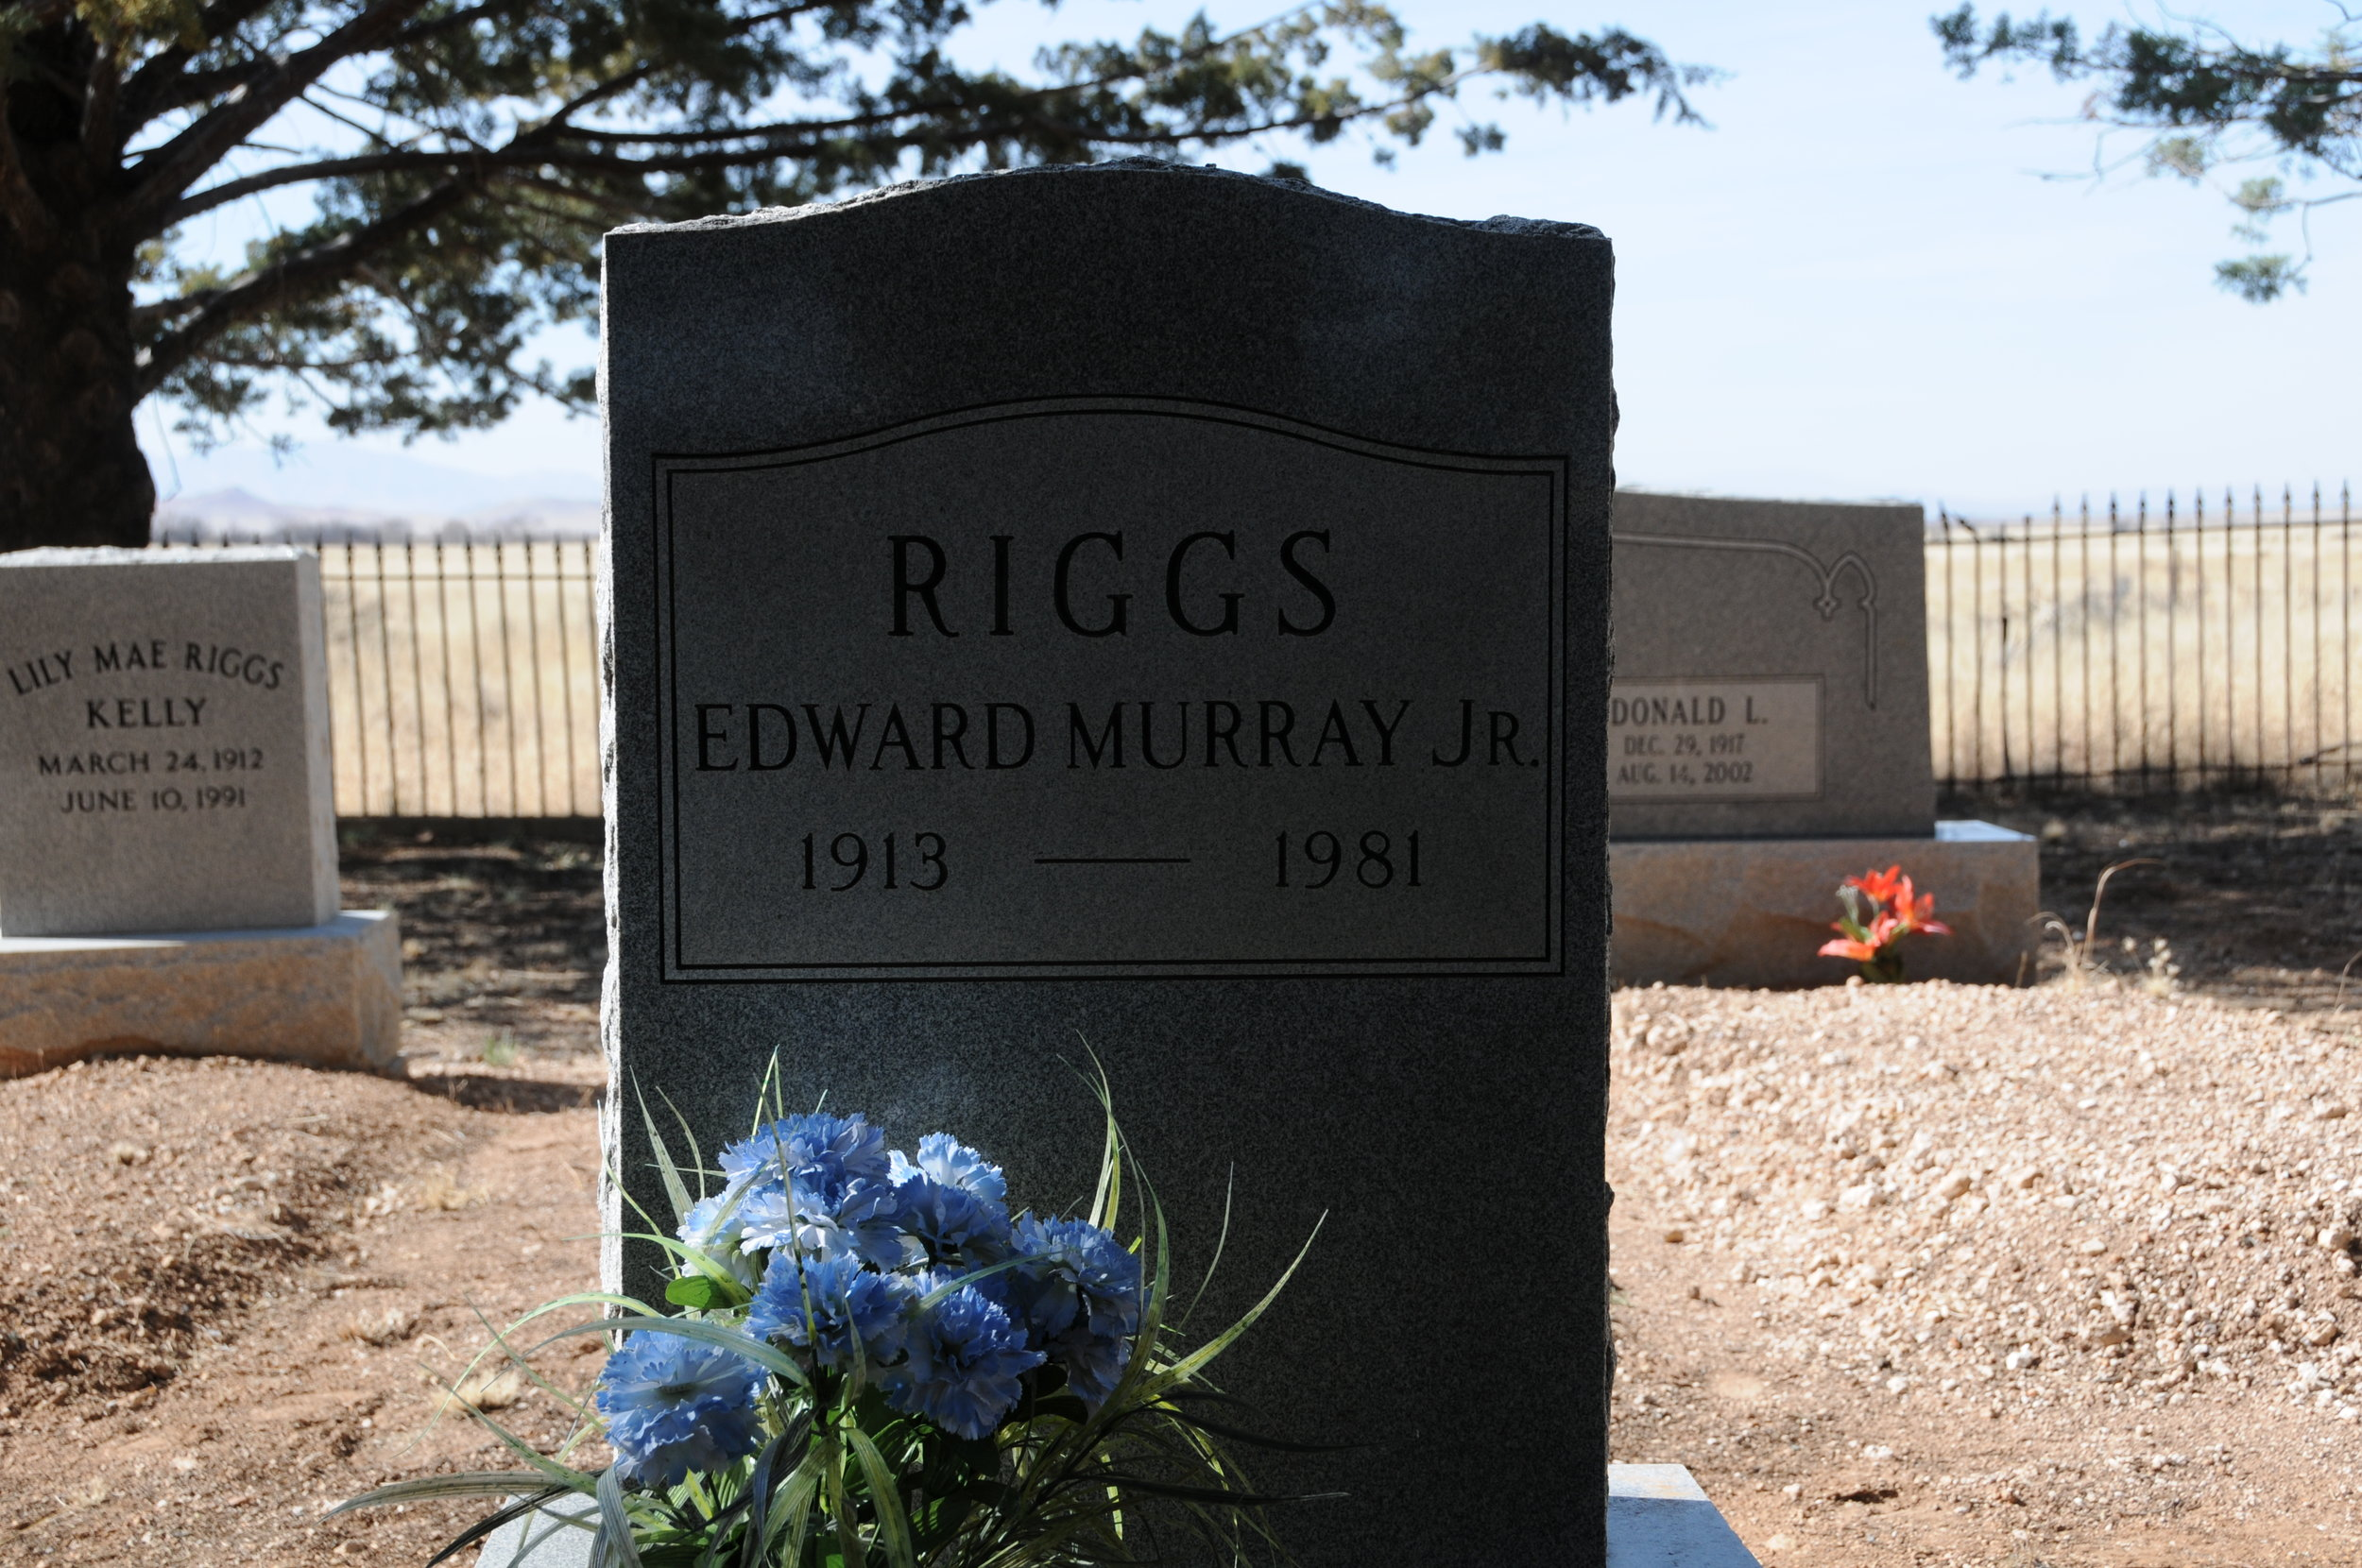 6b EDWARD MURRAY RIGGS JR.